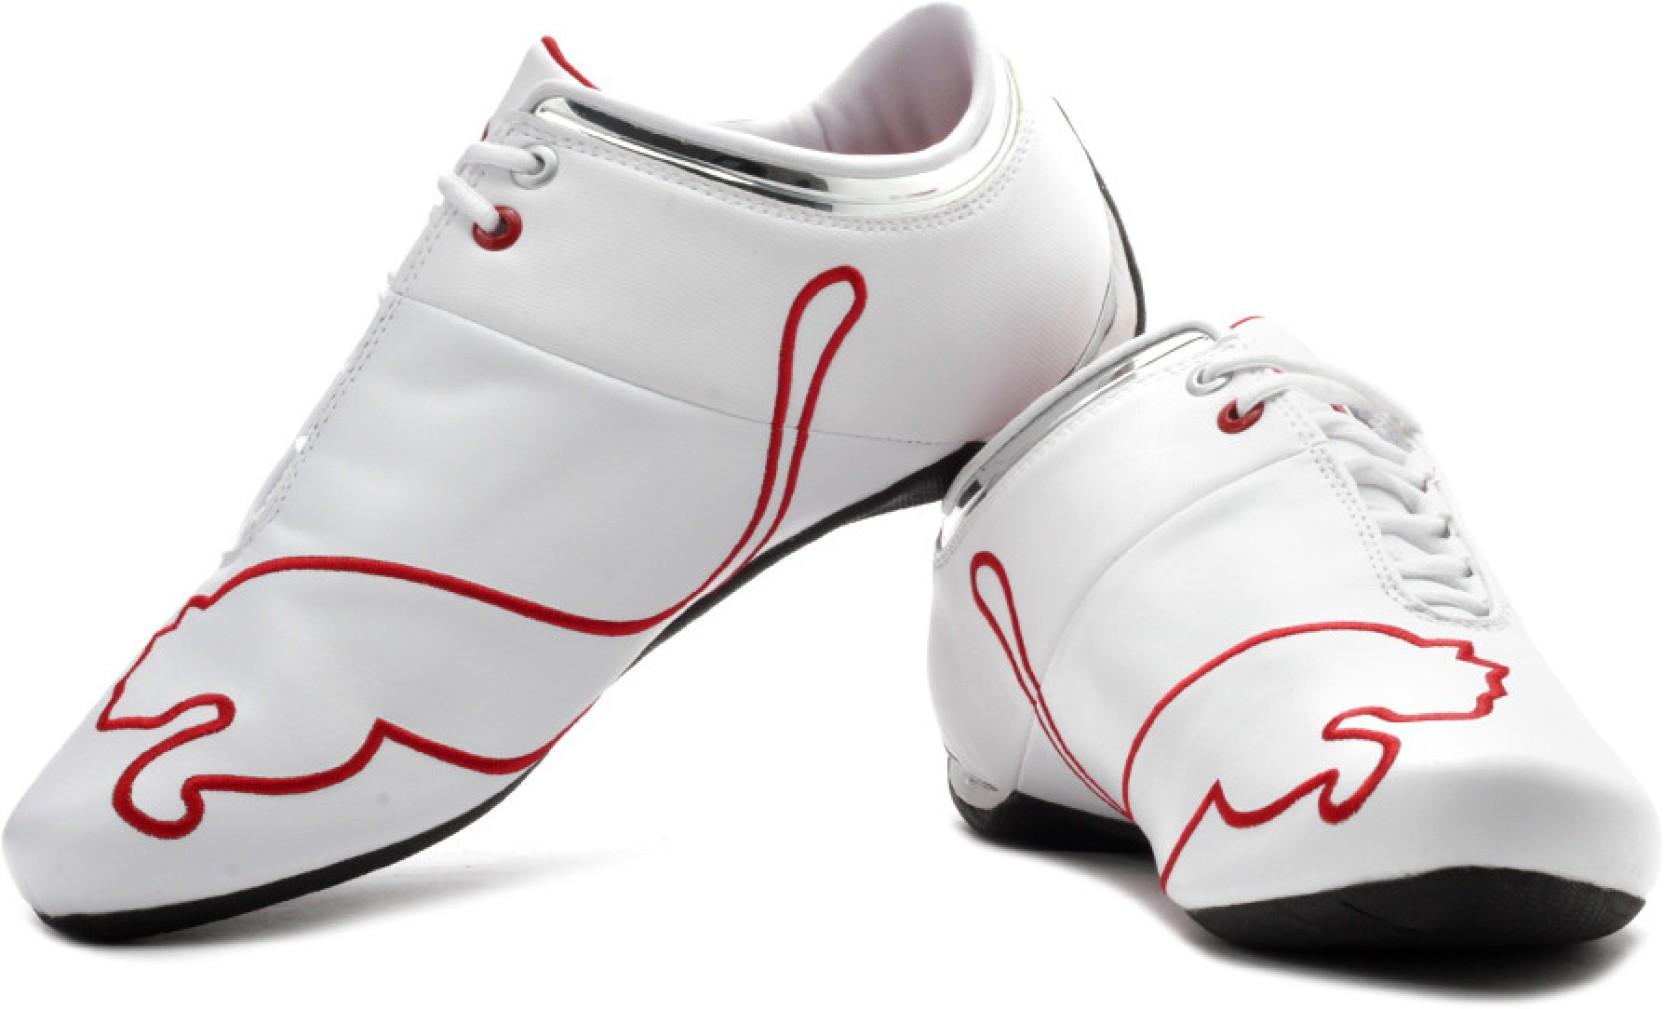 puma future cat m1 sf nm sneakers buy white rosso corsa. Black Bedroom Furniture Sets. Home Design Ideas